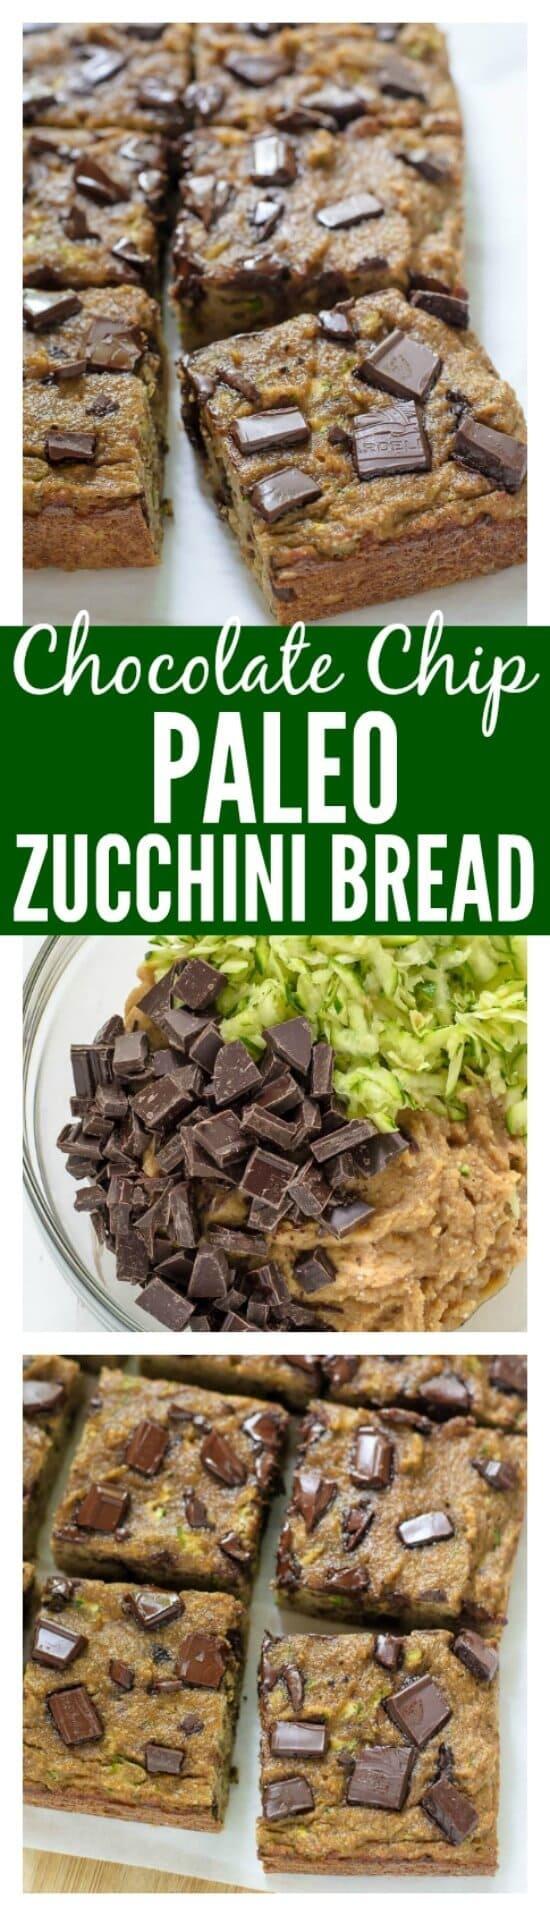 Chocolate Chip Paleo Zucchini Bread